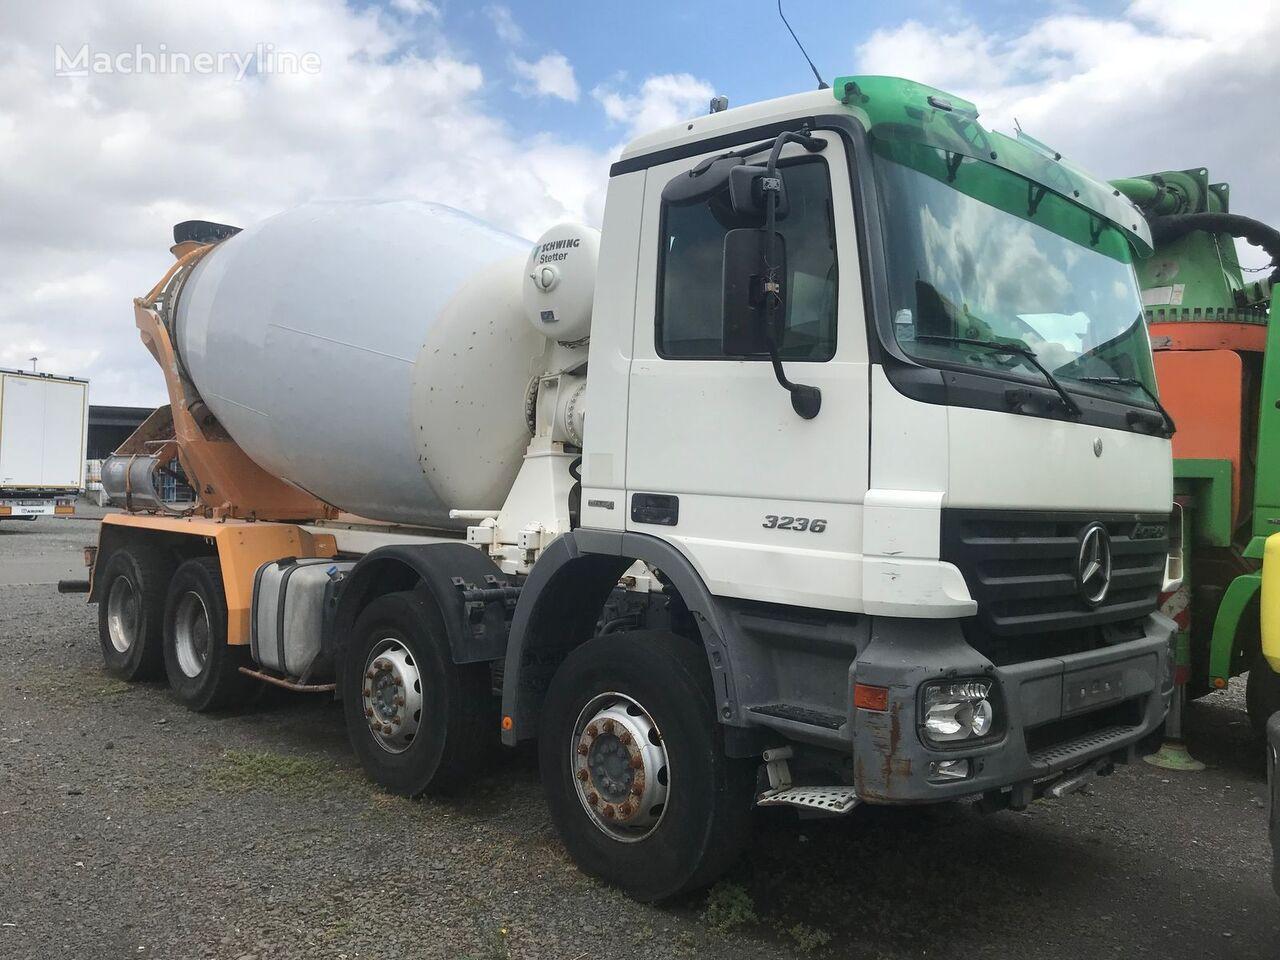 camião betoneira MERCEDES-BENZ Actros 3236